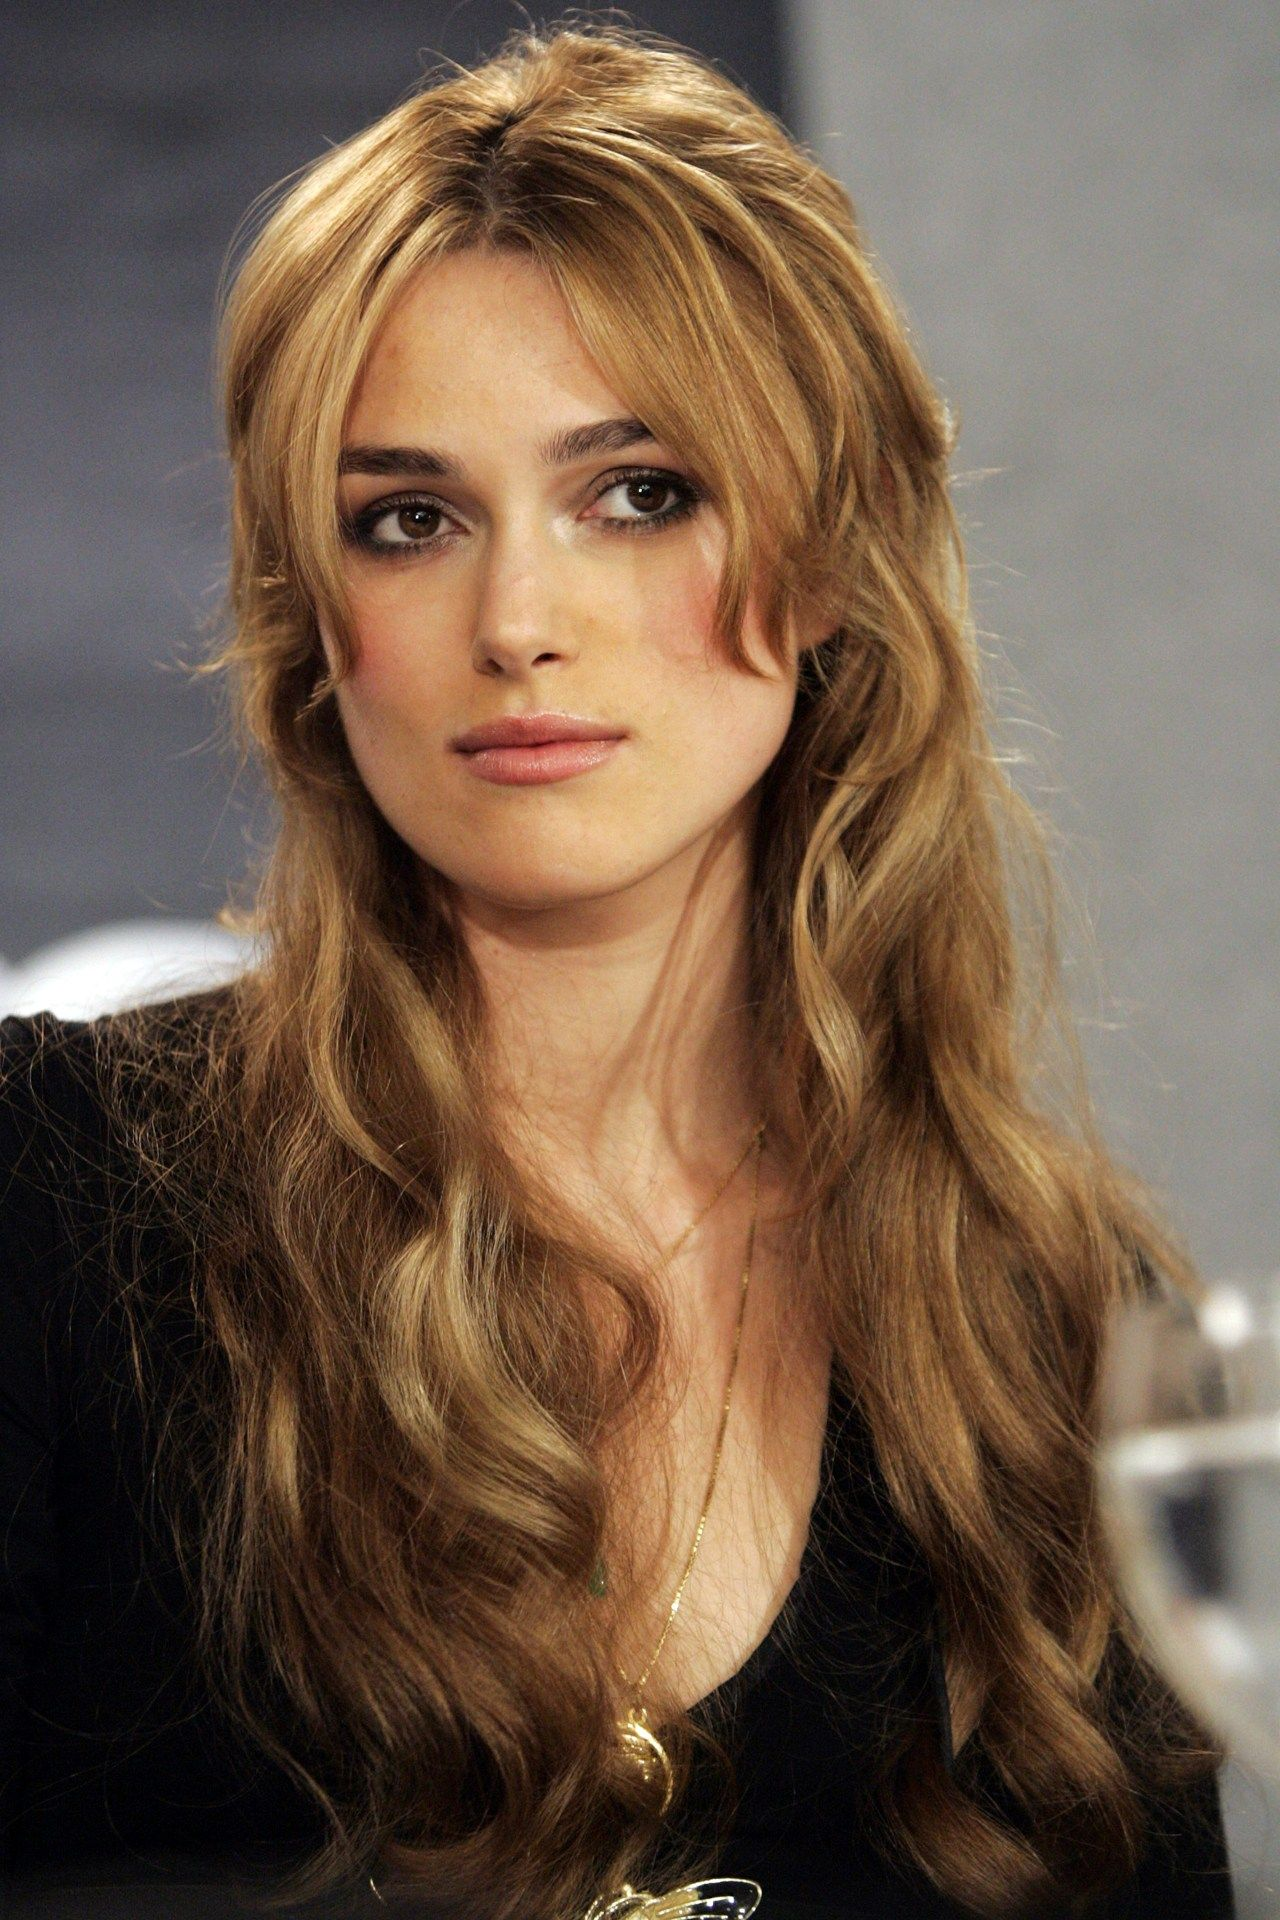 Keira knightley hair style file beauty and hair pinterest frisuren schauspieler und people - Frisuren pinterest ...